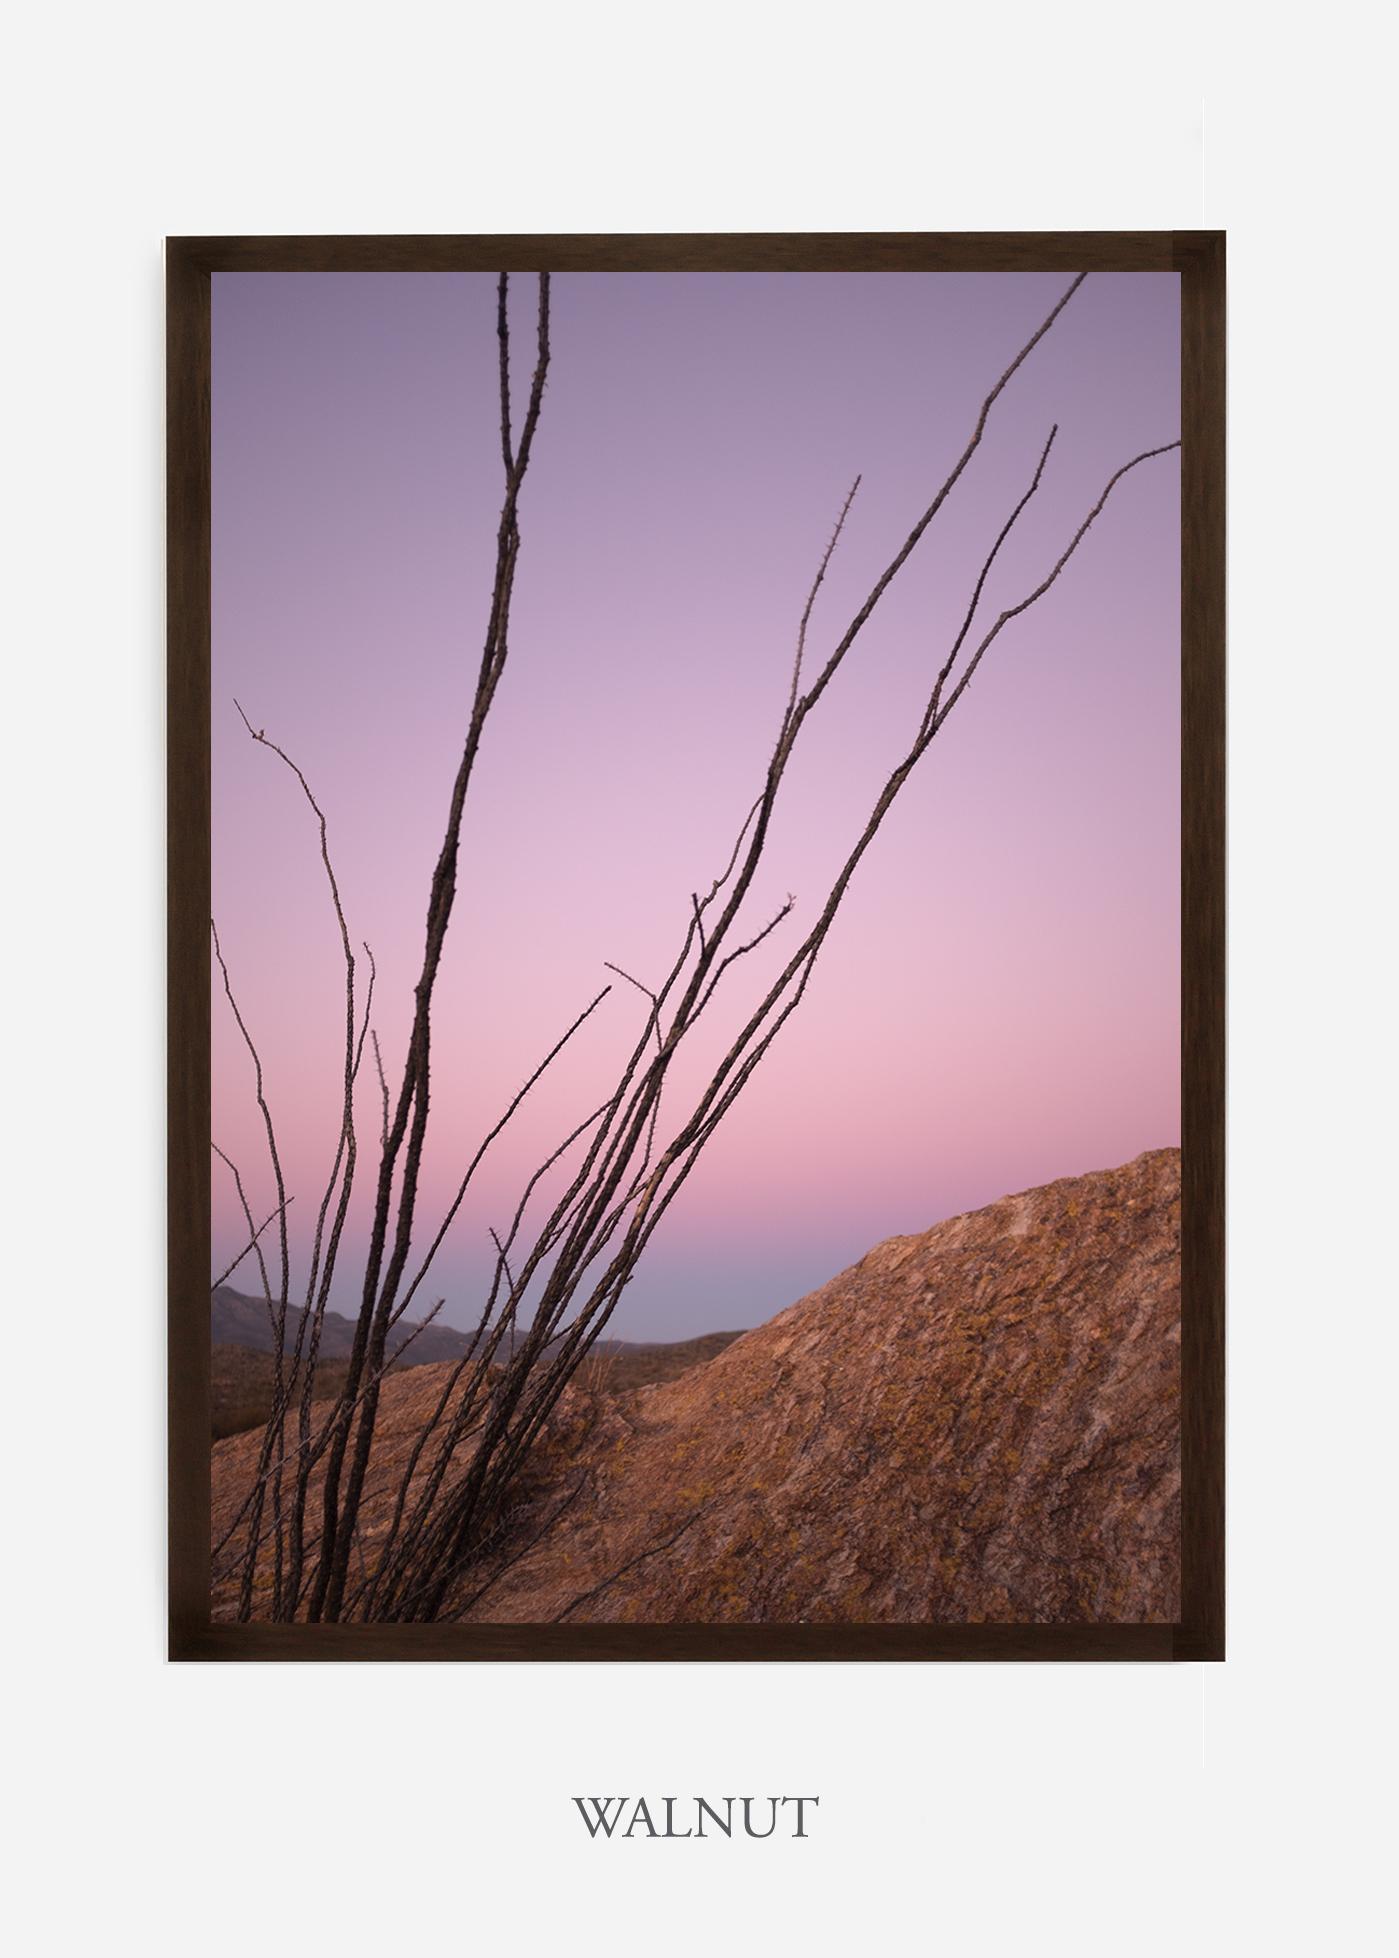 nomat-walnutframe-saguaroNo.12-wildercalifornia-art-wallart-cactusprint-homedecor-prints-arizona-botanical-artwork-interiordesign.jpg